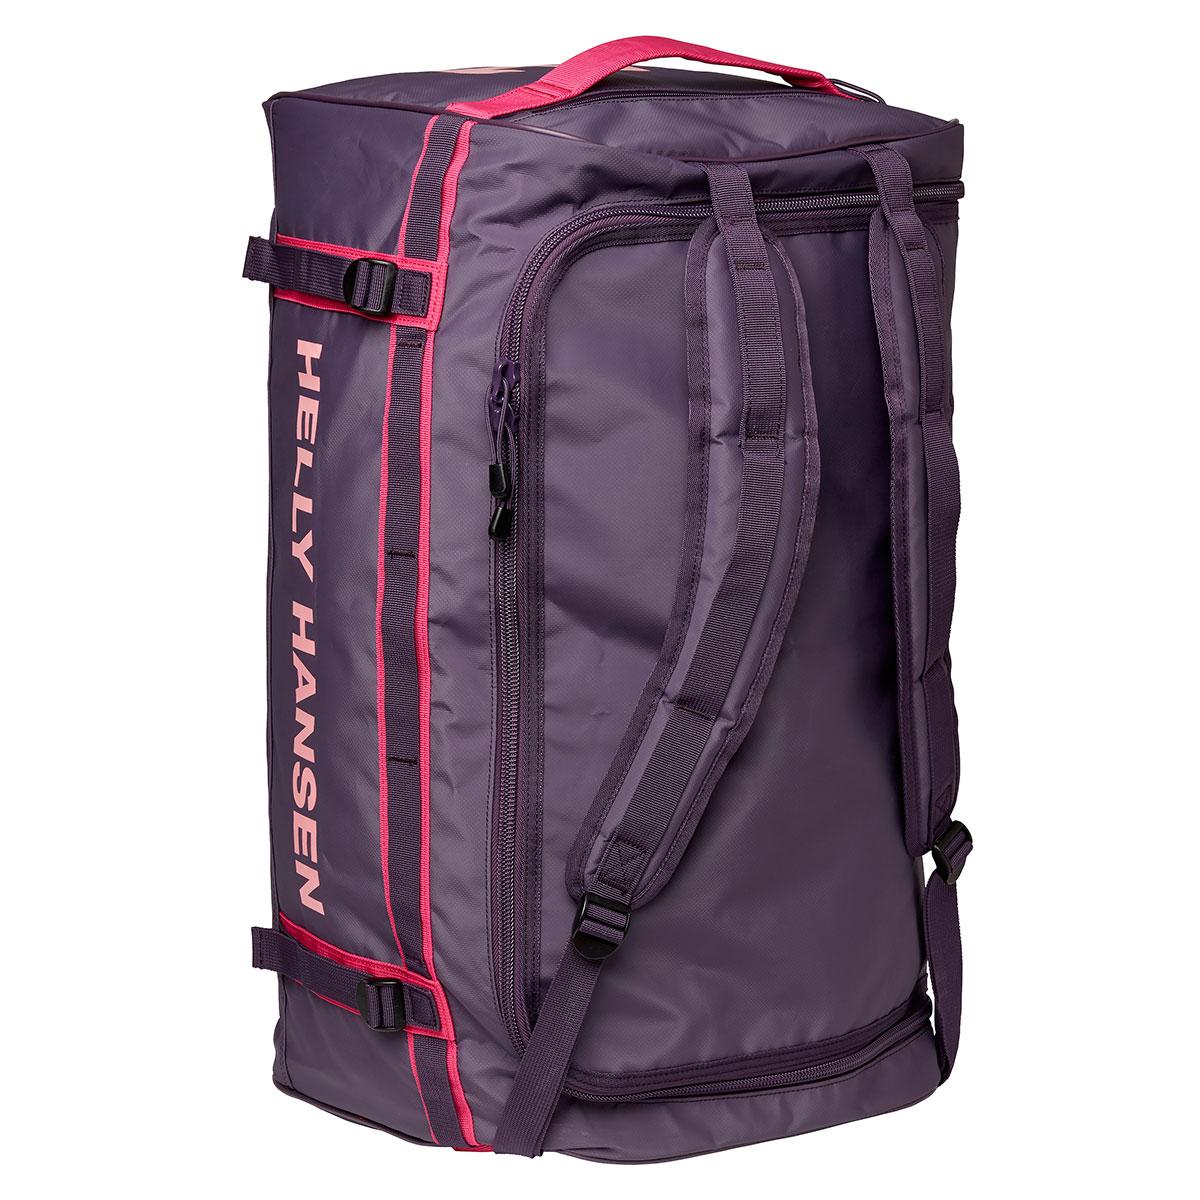 Helly Hansen 2019 HH New Classic Duffel Bag Waterproof Rucksack 27/% OFF RRP